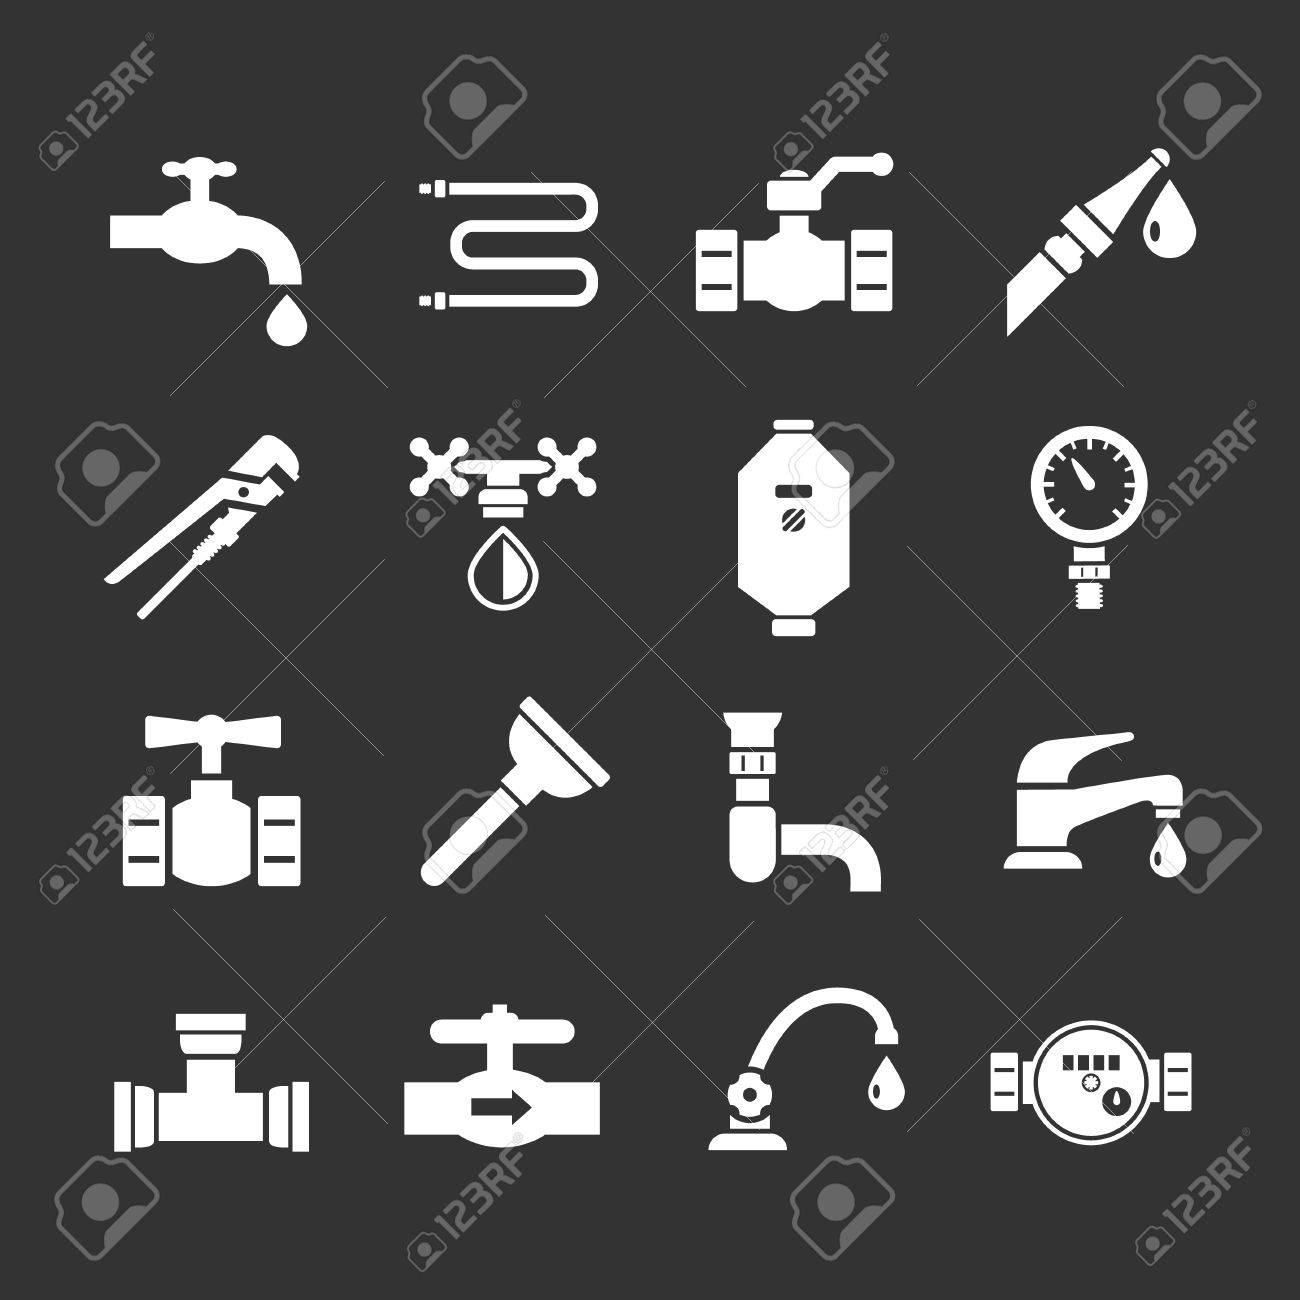 Set icons of plumbing isolated on black - 29822859